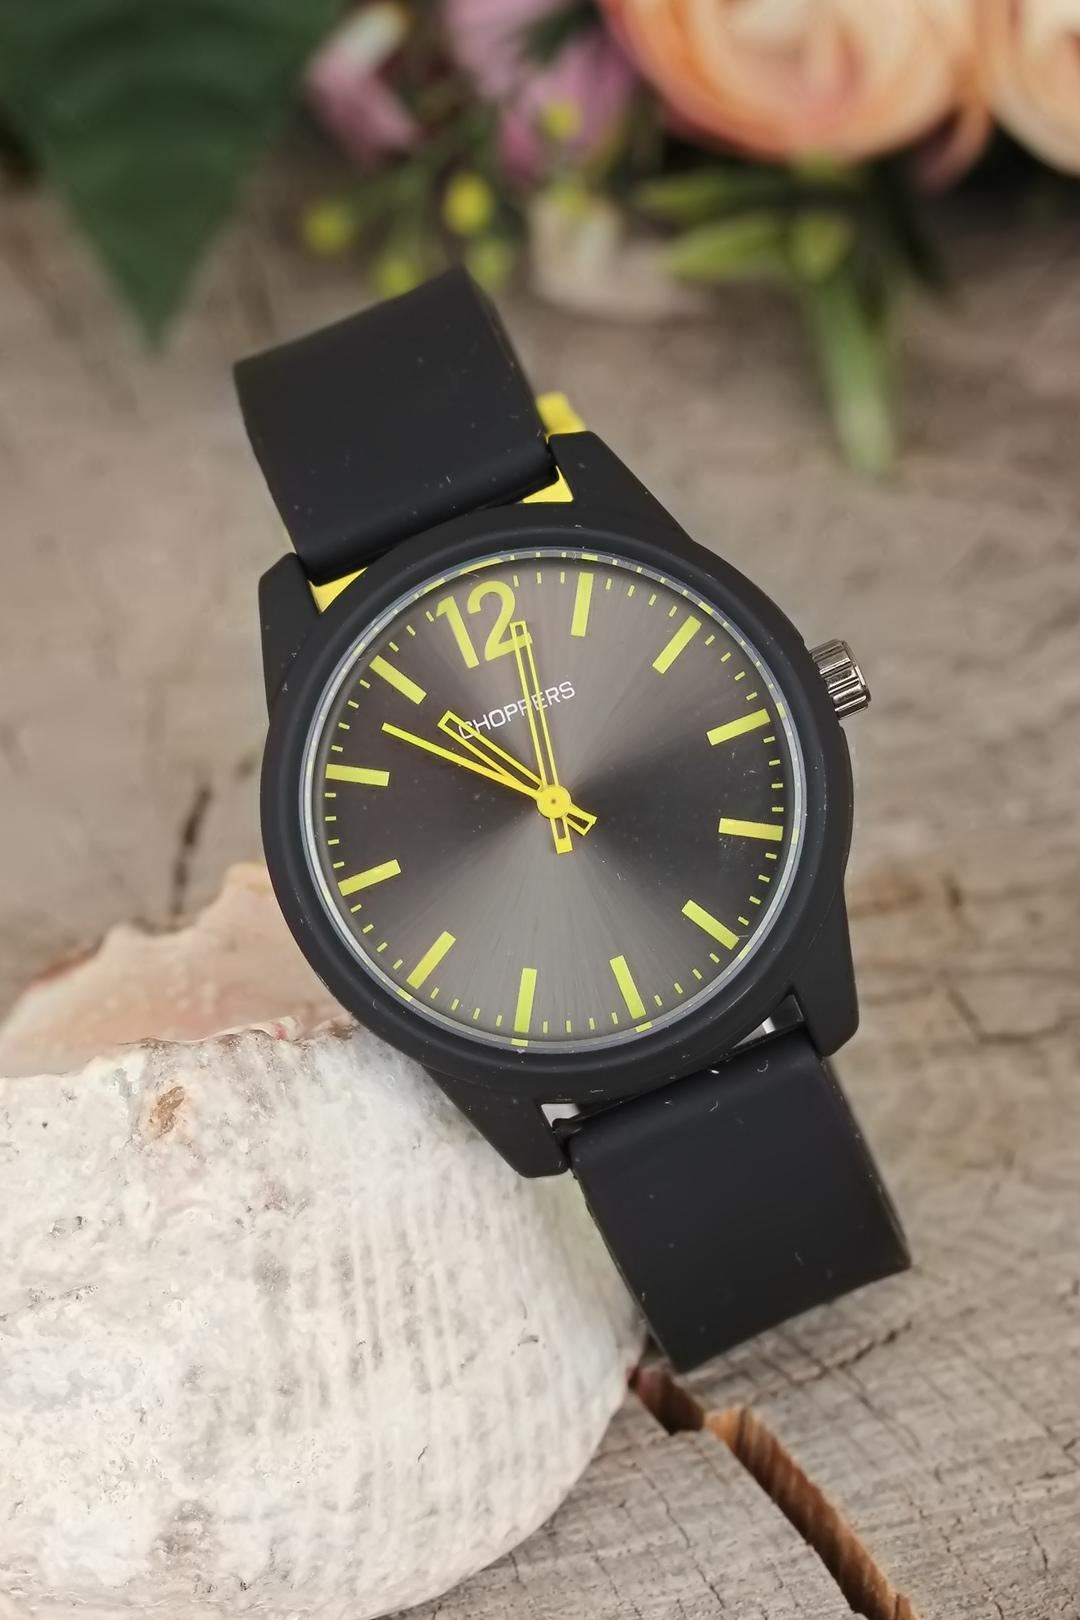 Siyah Renk Silikon Kordonlu Sarı Kadranlı Bayan Kol Saati